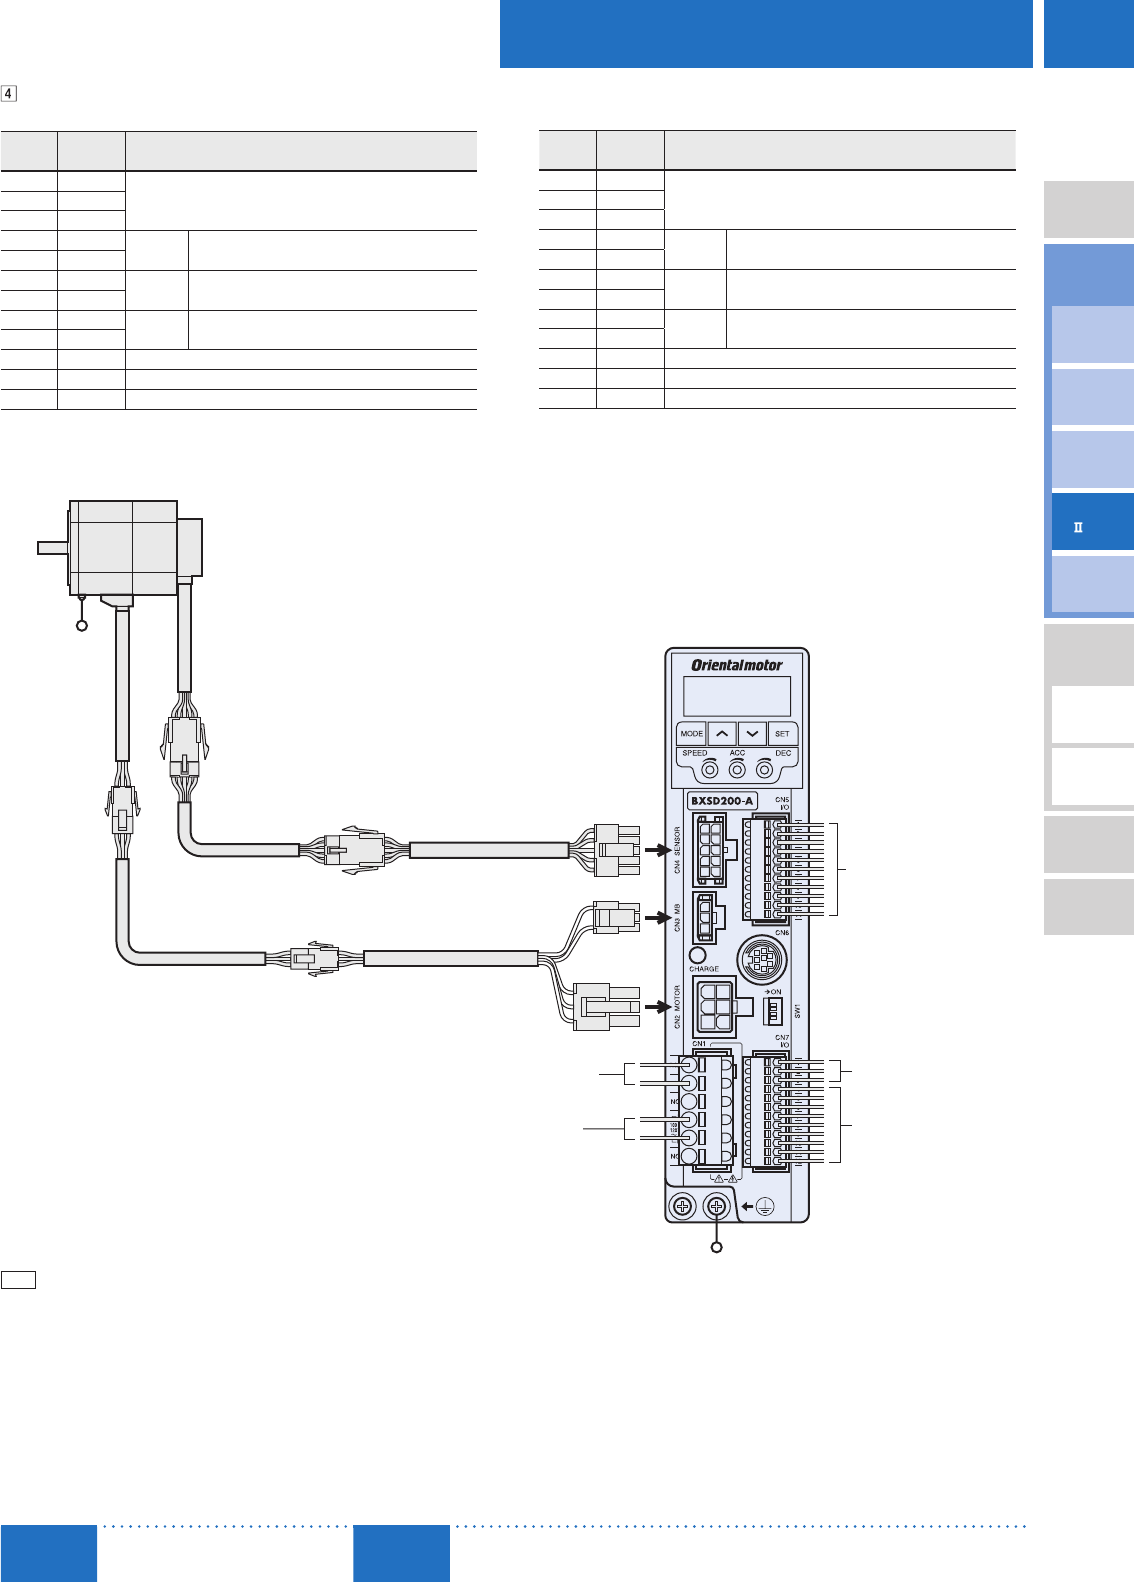 Flow Oriental Motors Bxii Series Ac Input Brushless Dc Motor Driver Wiring Diagram D 113